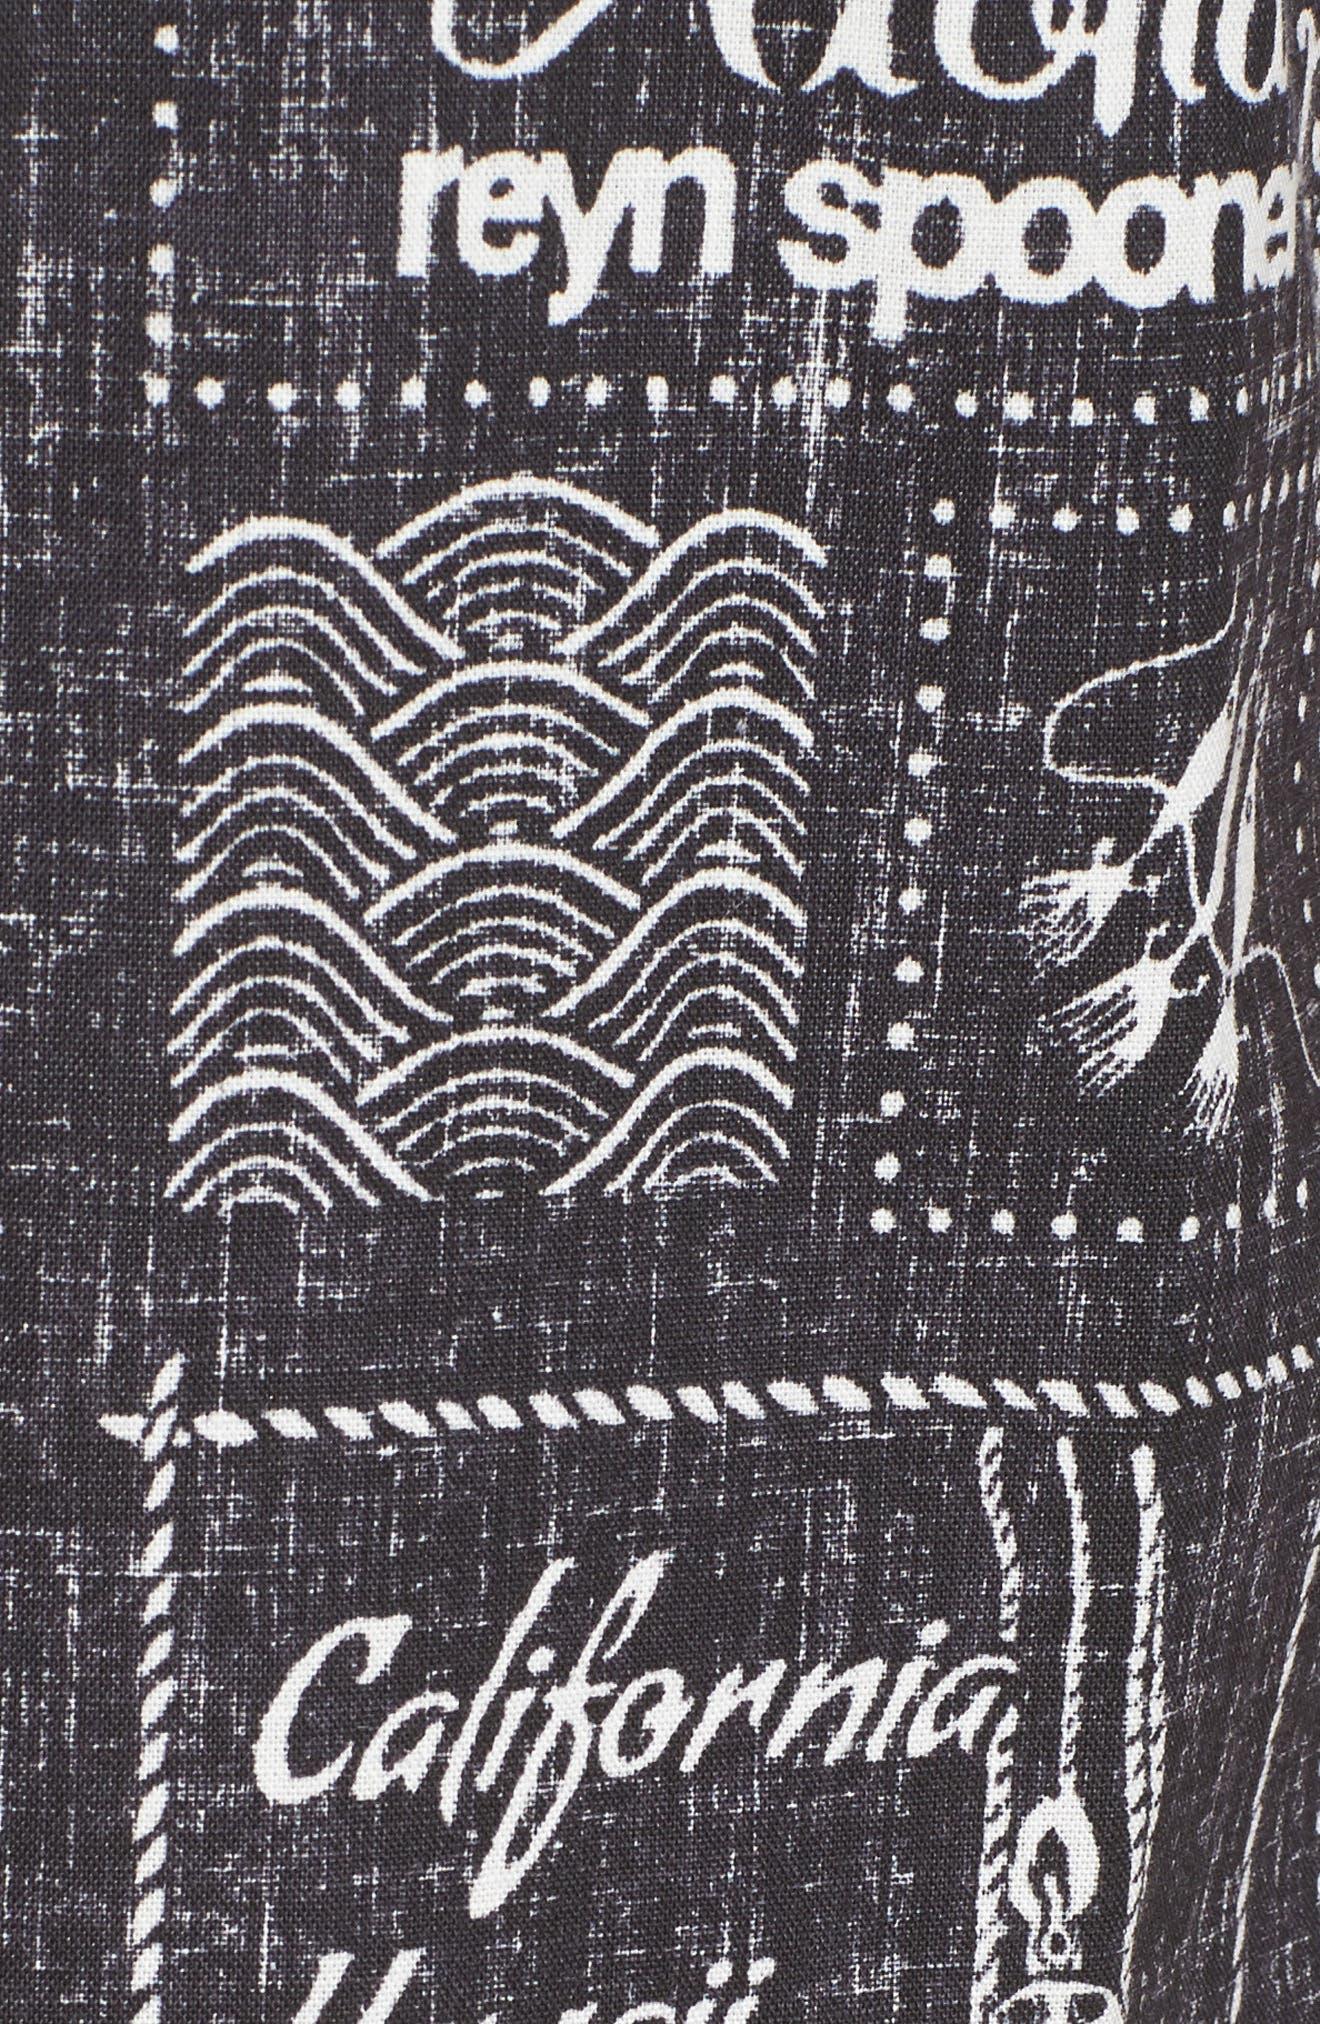 Stories from the East Regular Fit Sport Shirt,                             Alternate thumbnail 5, color,                             Black